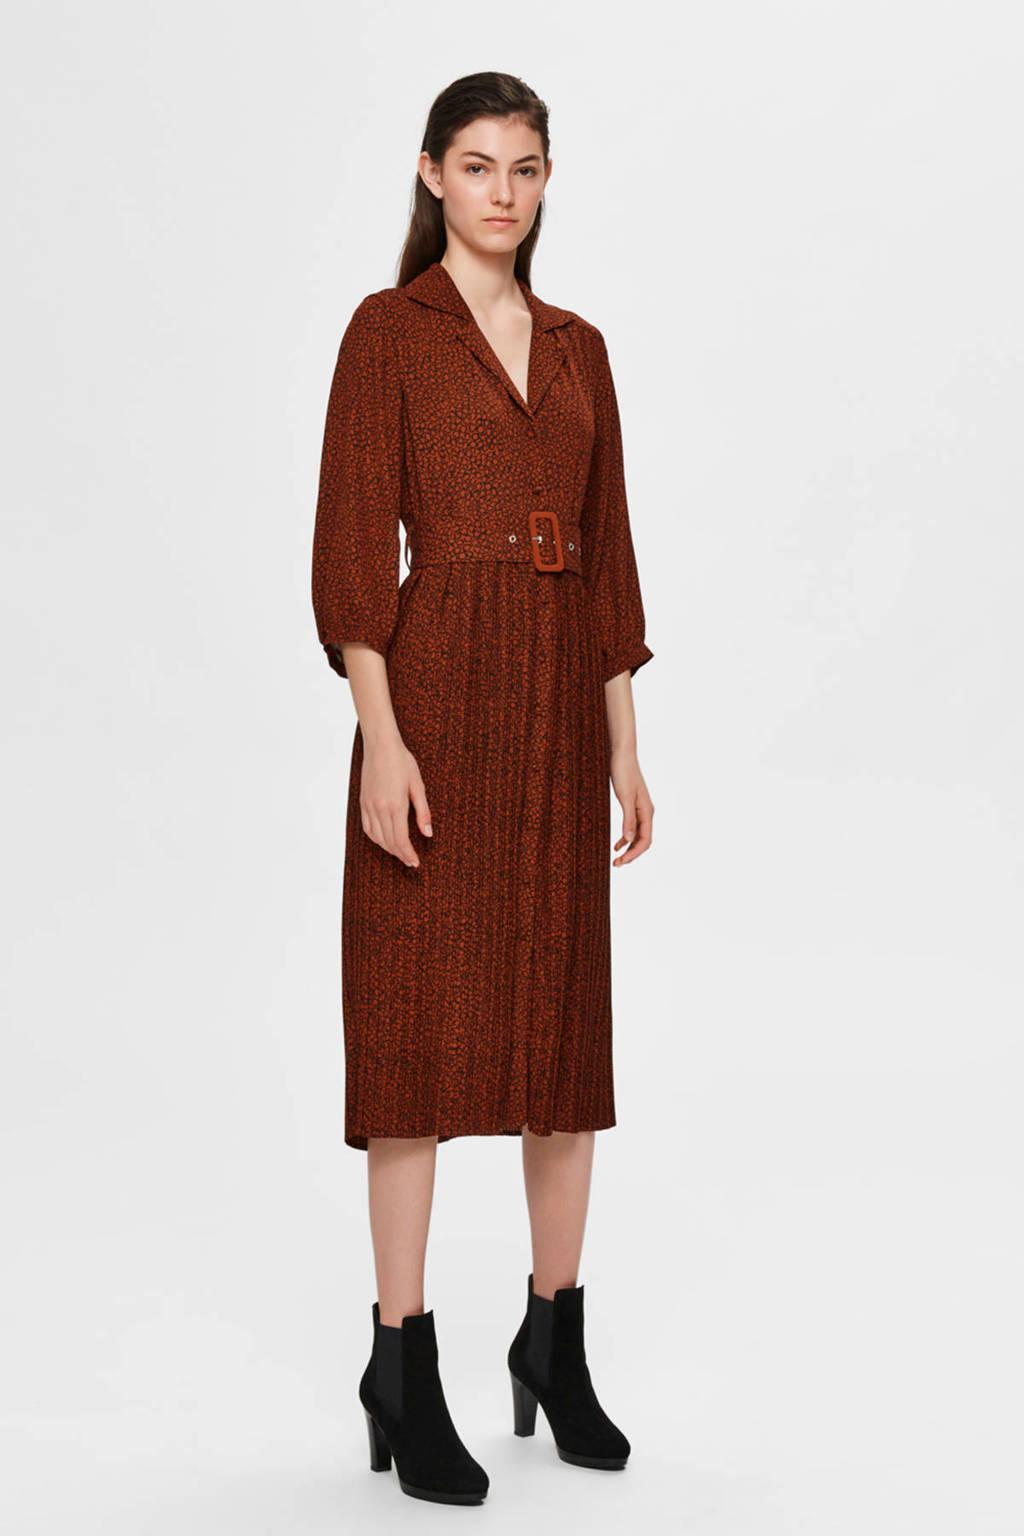 SELECTED FEMME jurk met all over print donkerrood, Donkerrood